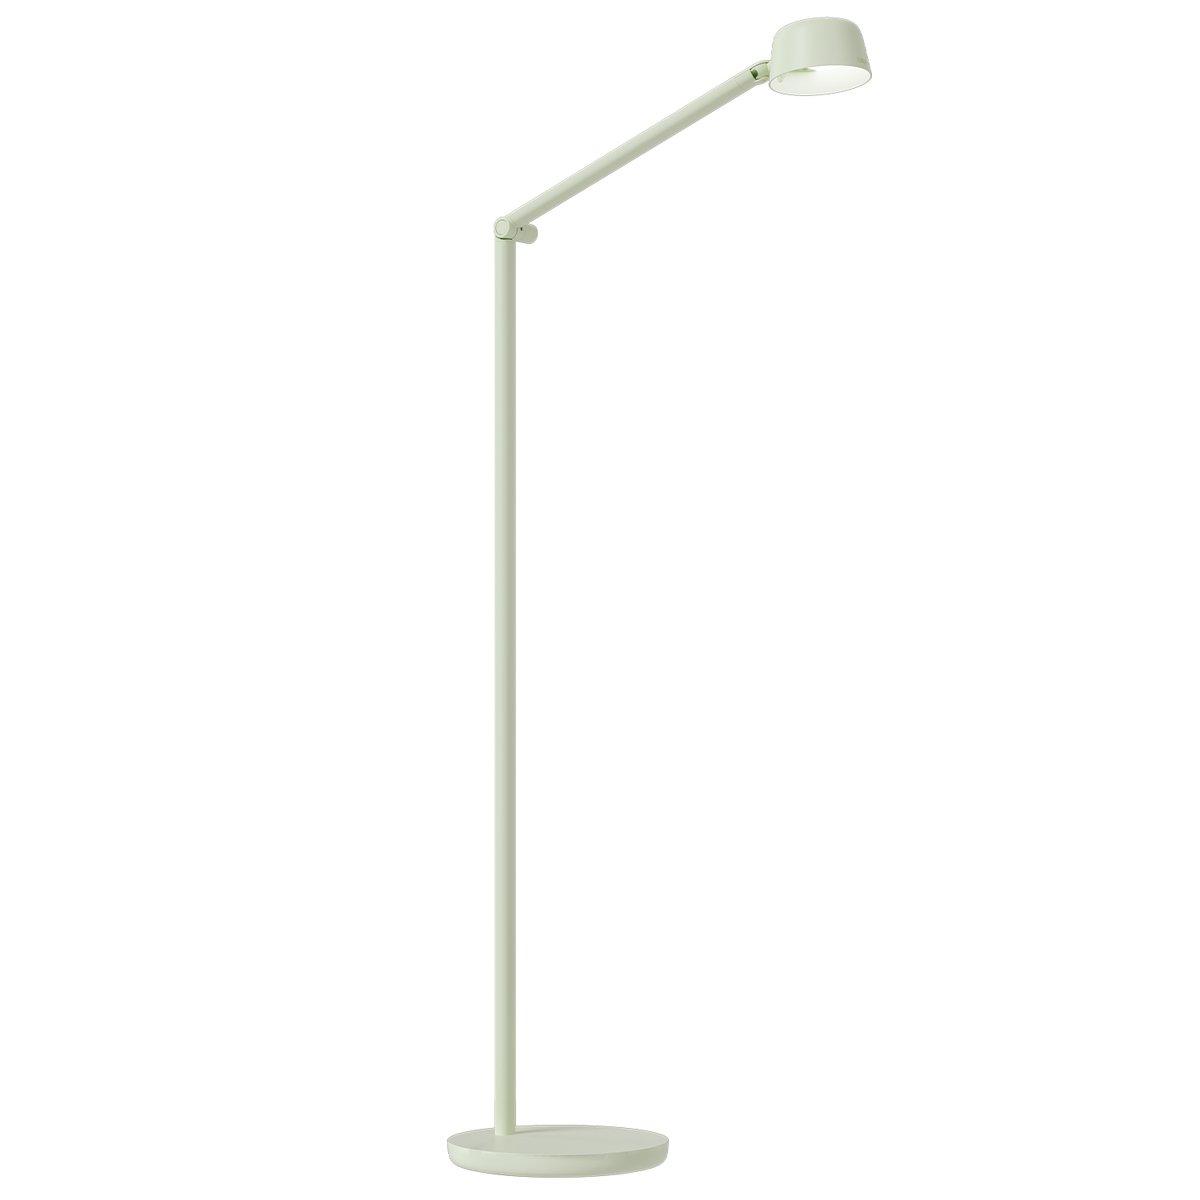 Luxo Motus Floor-2 Floor Lamp, Mild Citrus